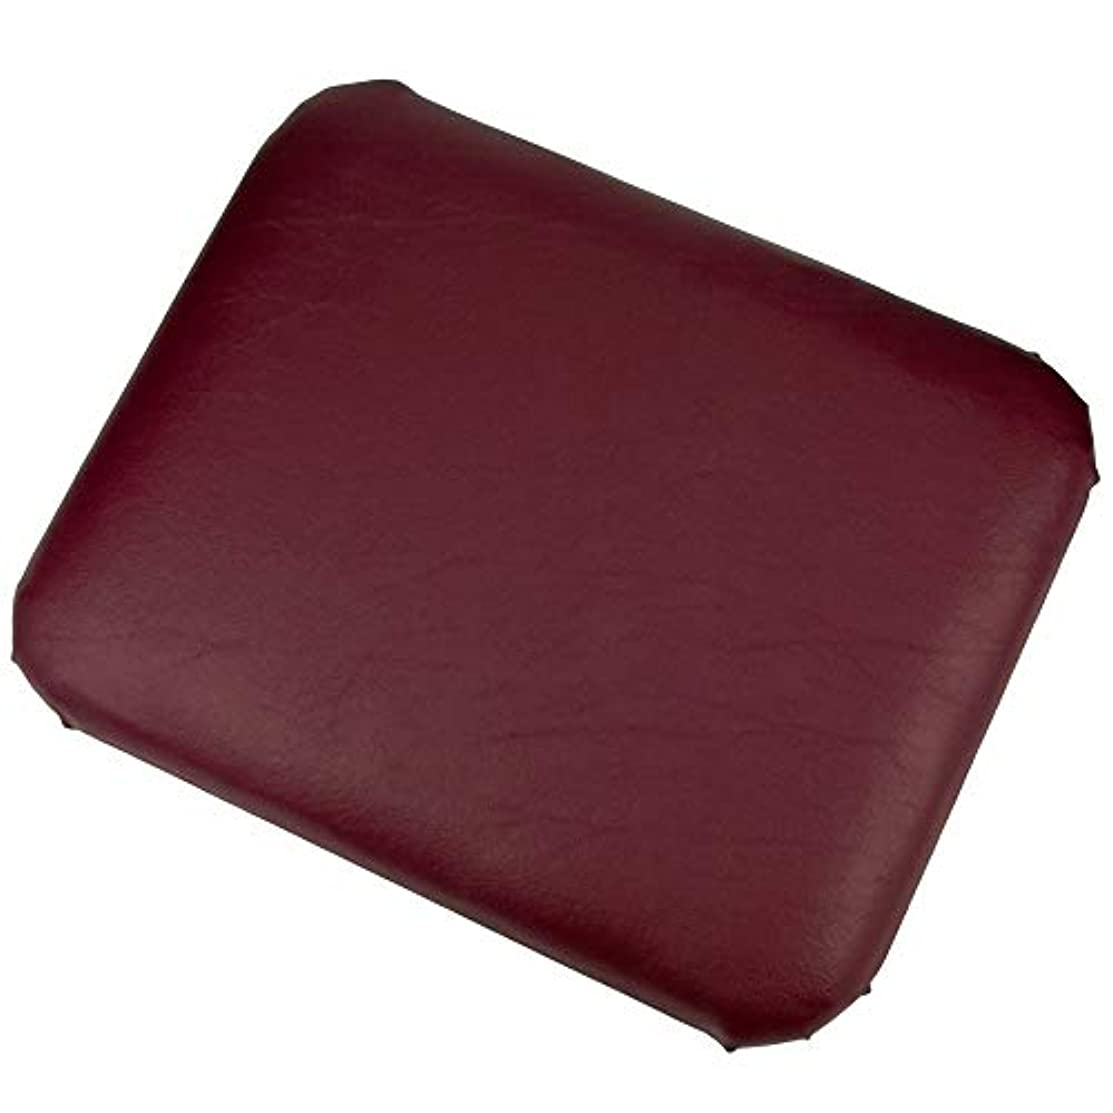 LLOYD (ロイド) テーブルボード 骨盤 マッサージ 柔らかすぎる テーブル や ベッド を安定させ 脊椎 の 前方変位 の 矯正 などにも最適 【ルビー】